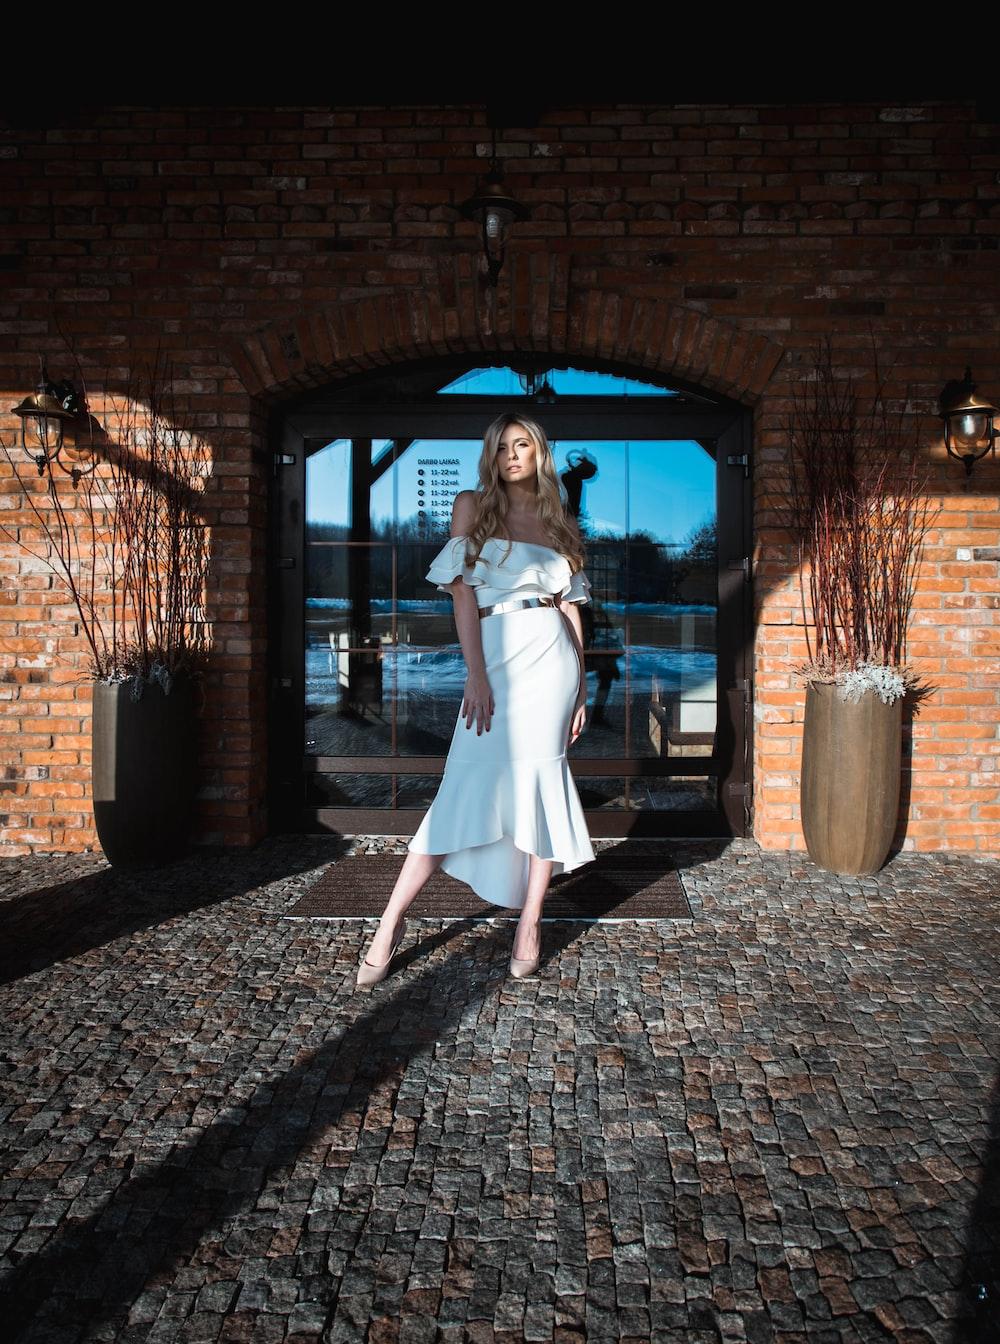 woman wearing white dress